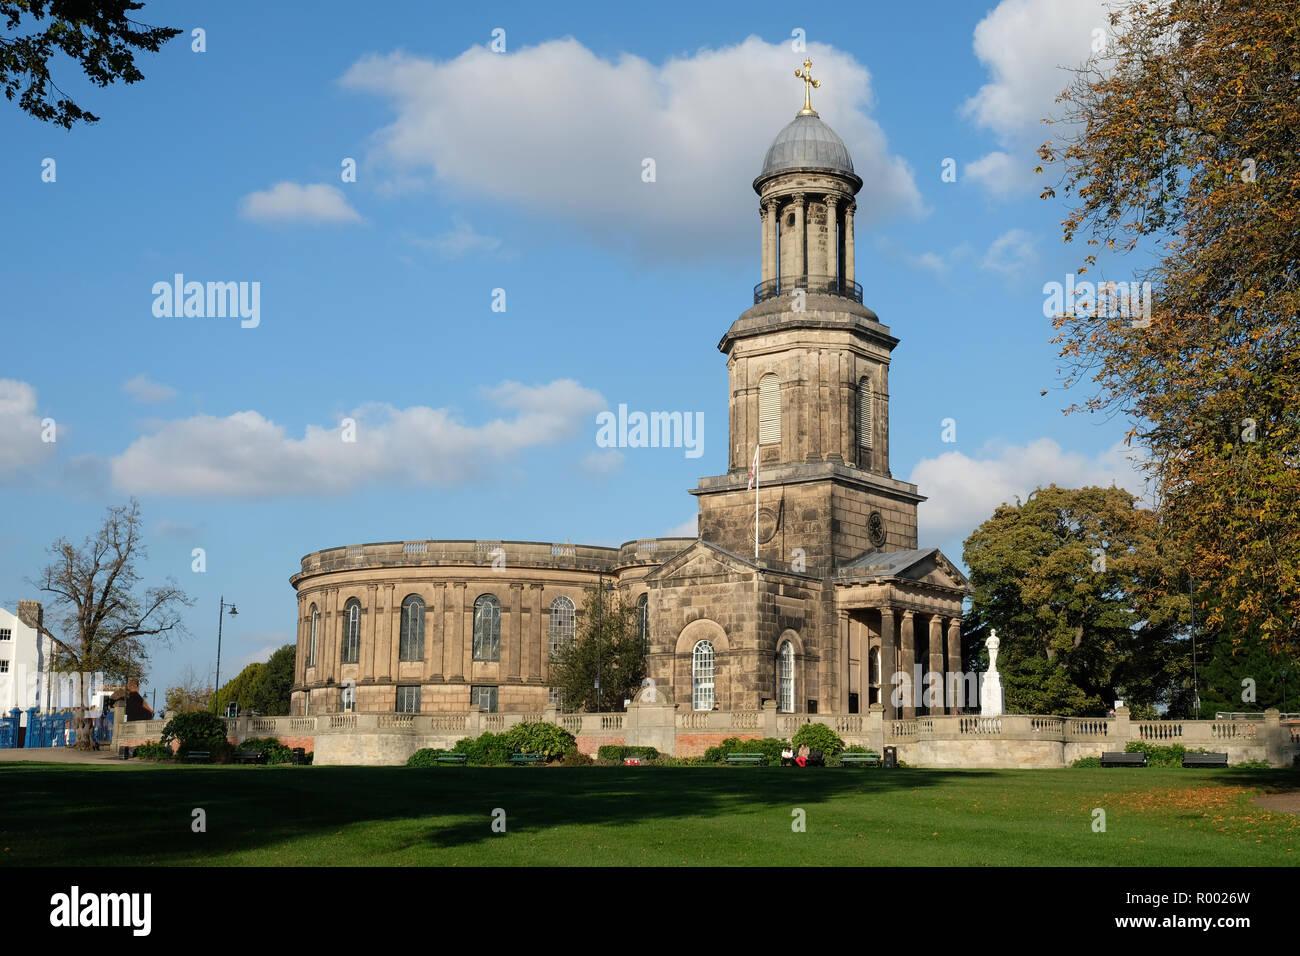 The Georgian church of St Chad, a prominent landmark in Shrewsbury, England - Stock Image